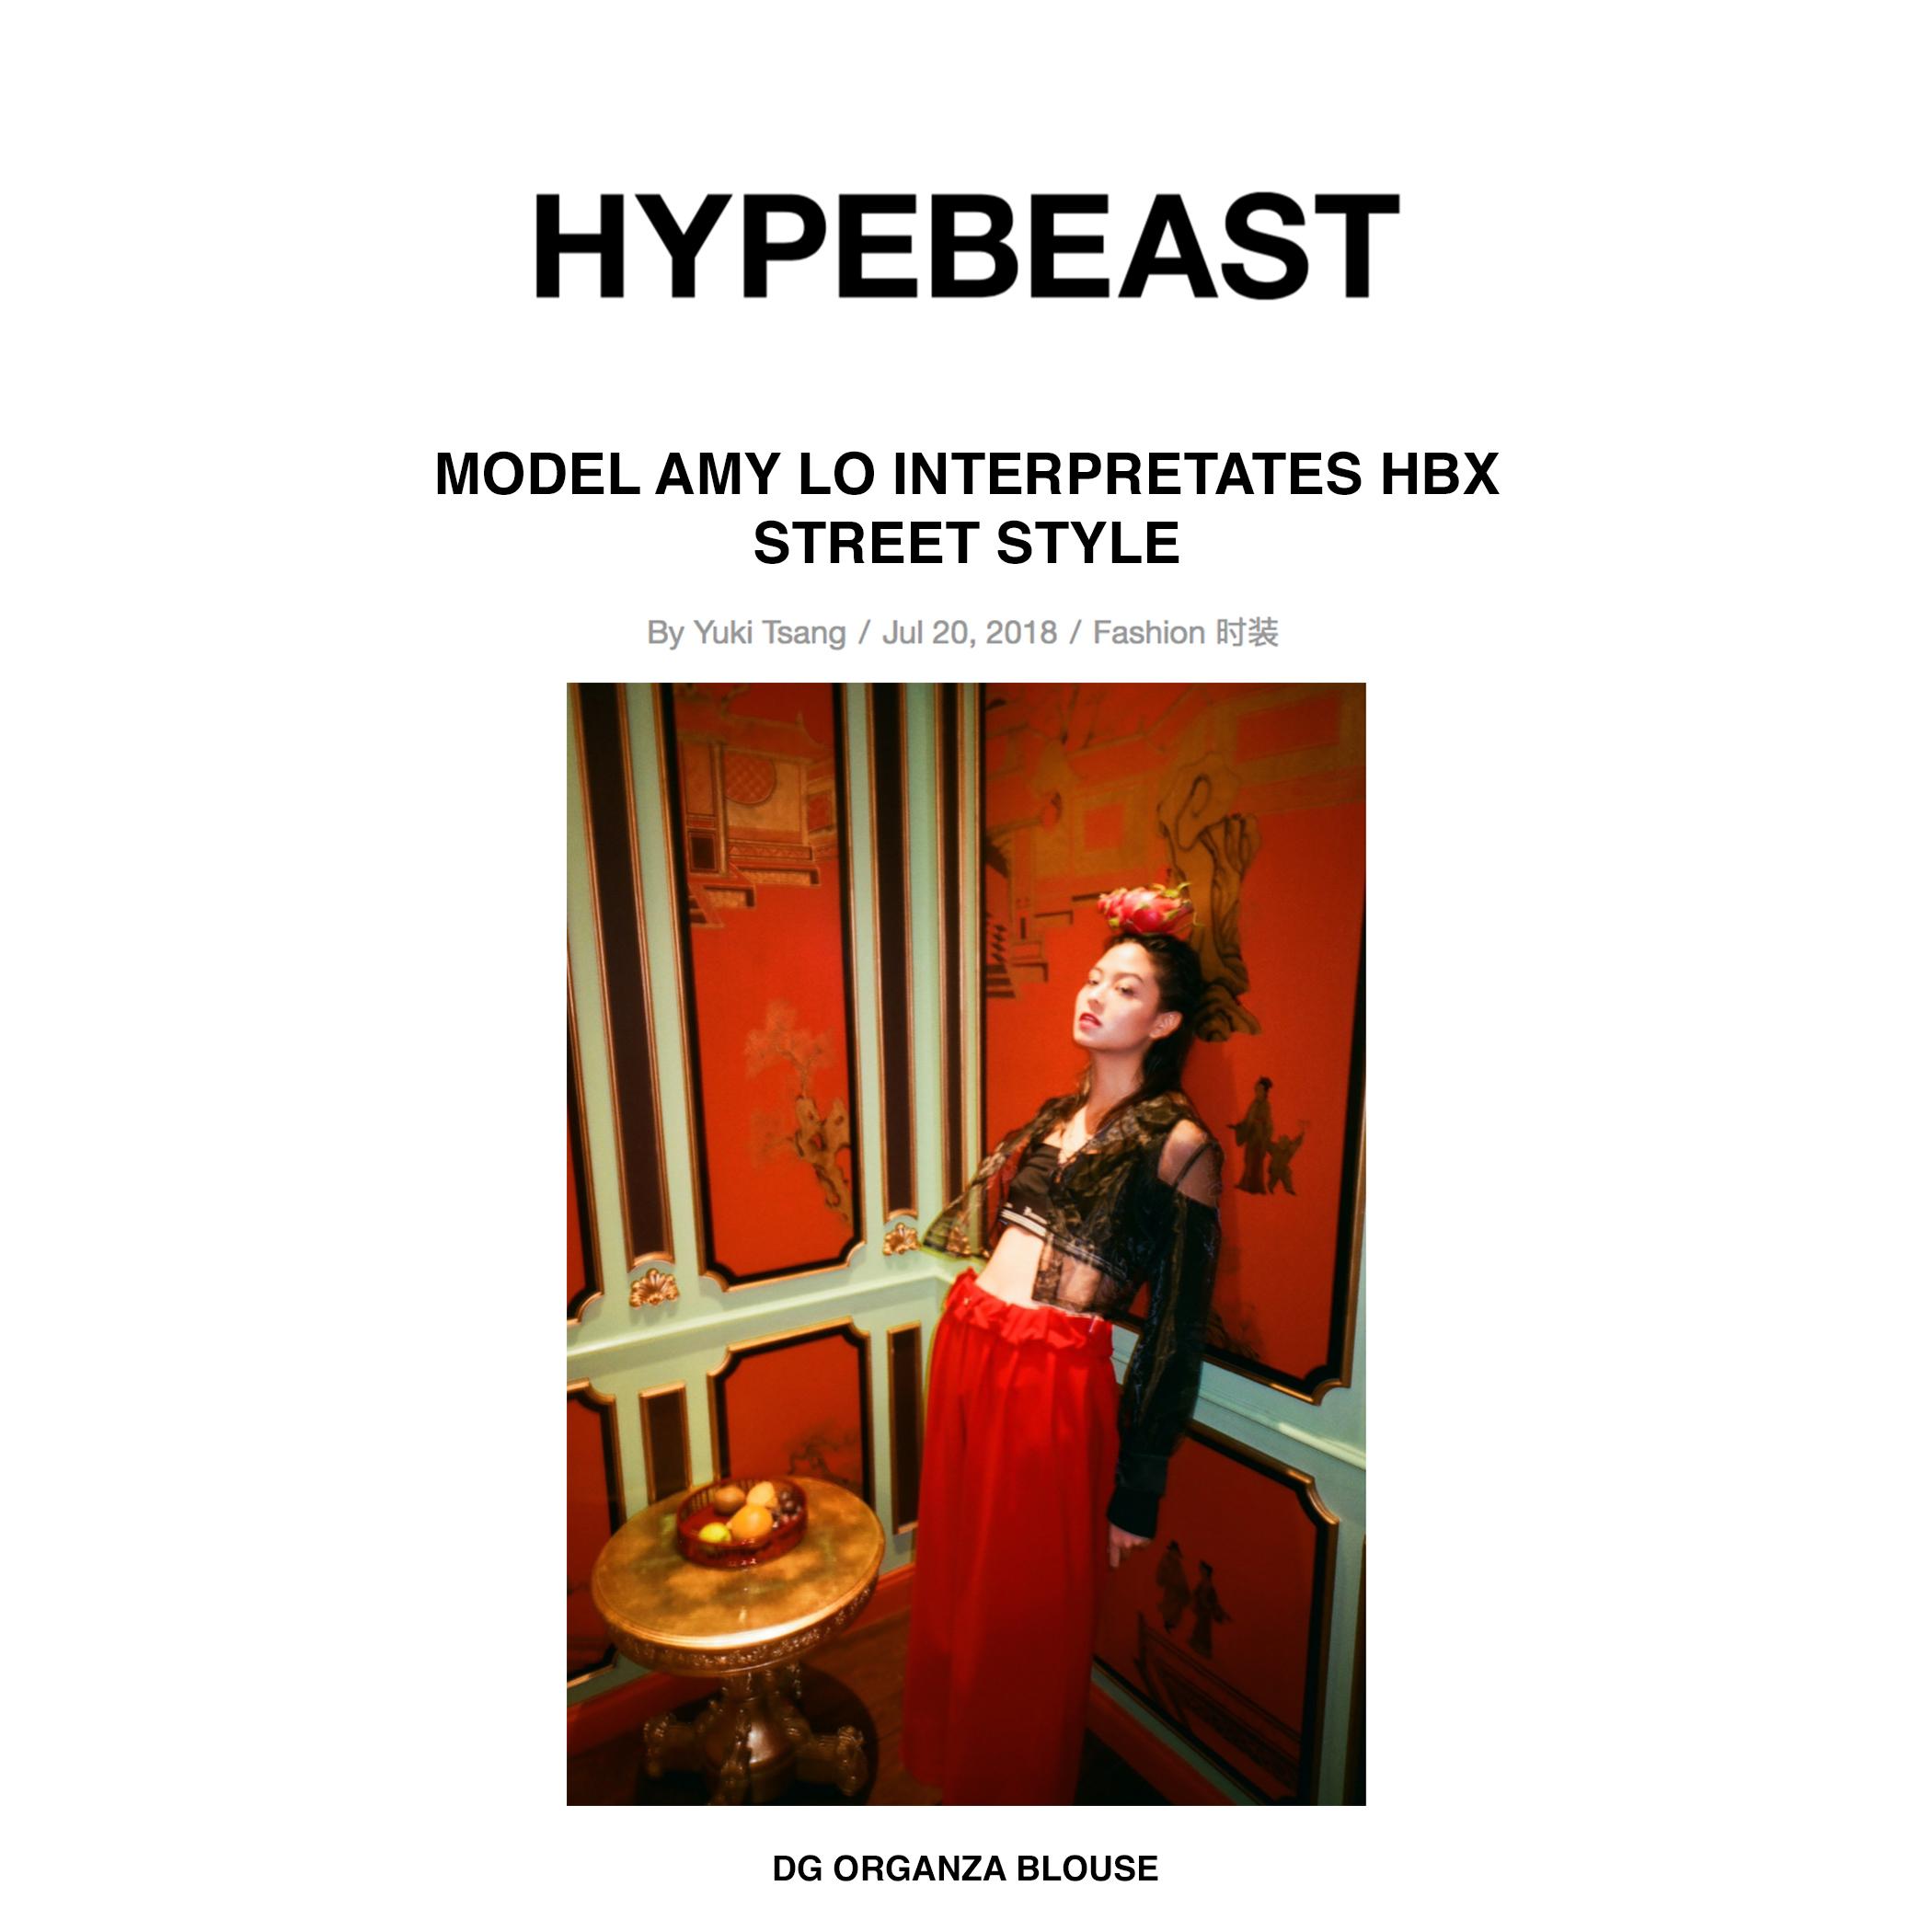 HYPEBEAST // JULY 2018